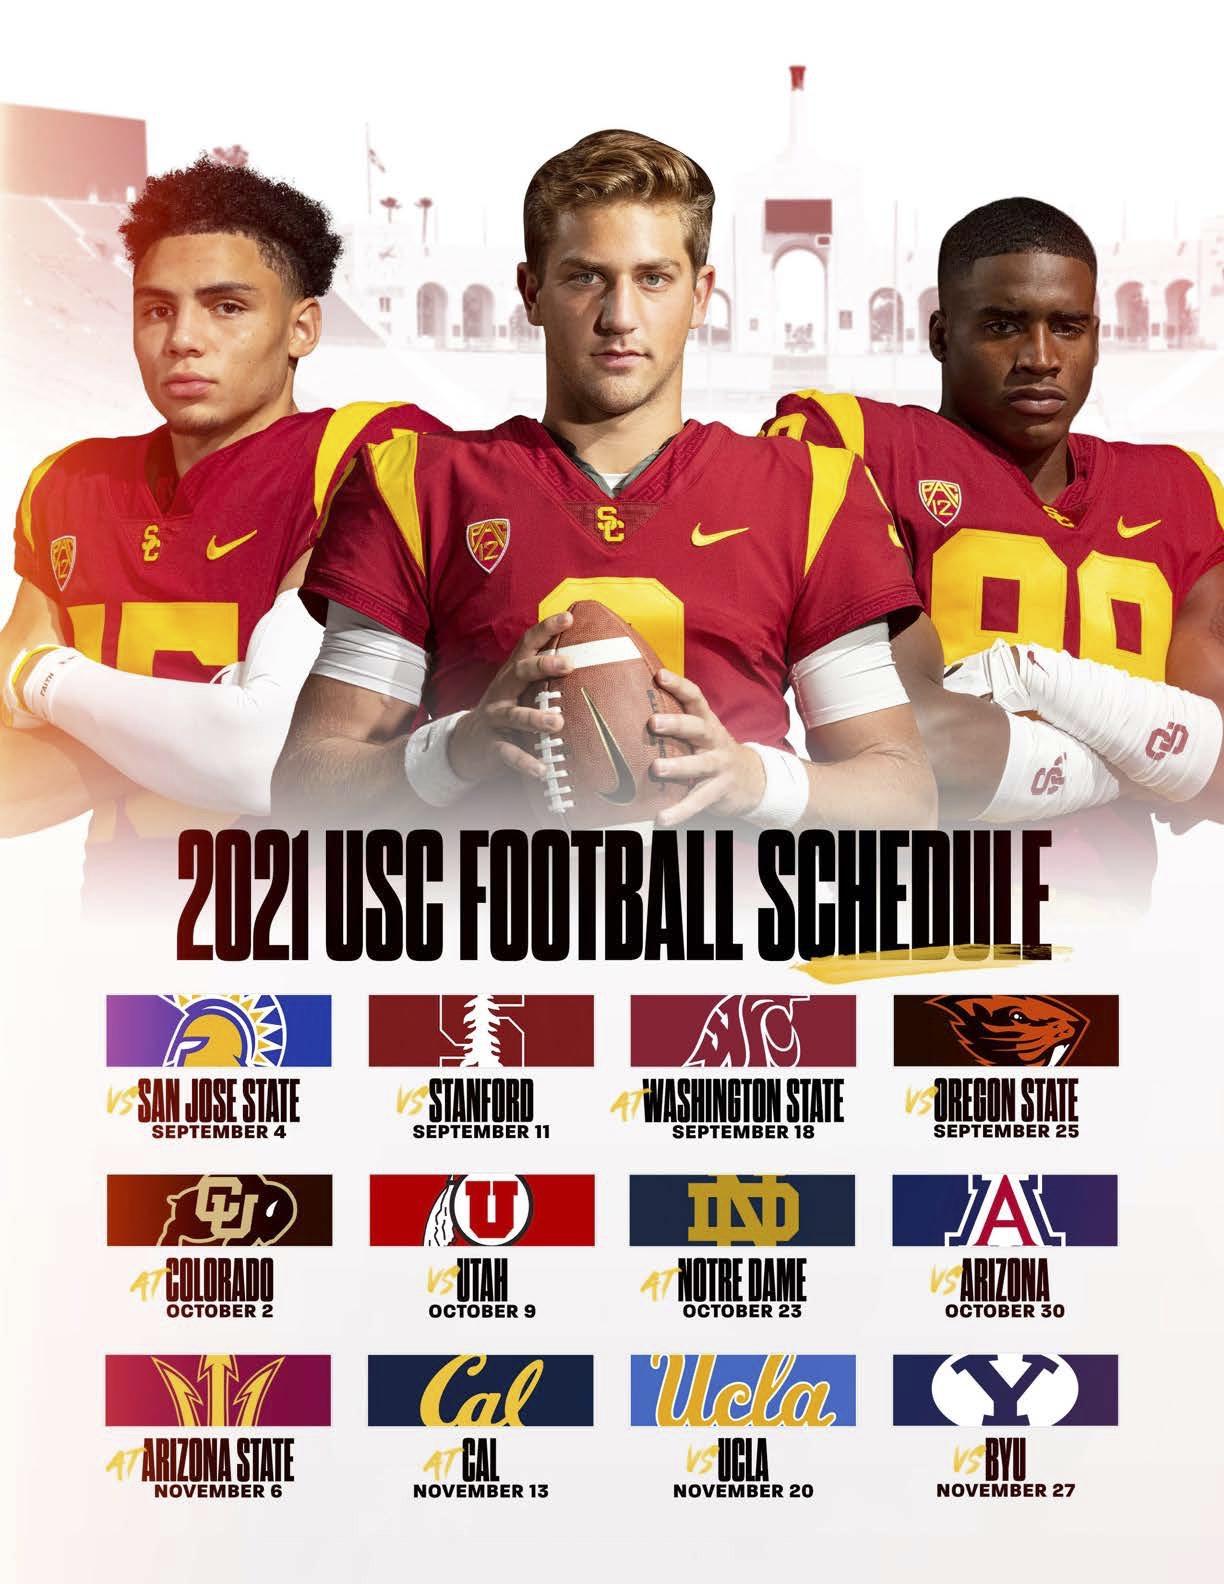 2021 USC Football Schedule